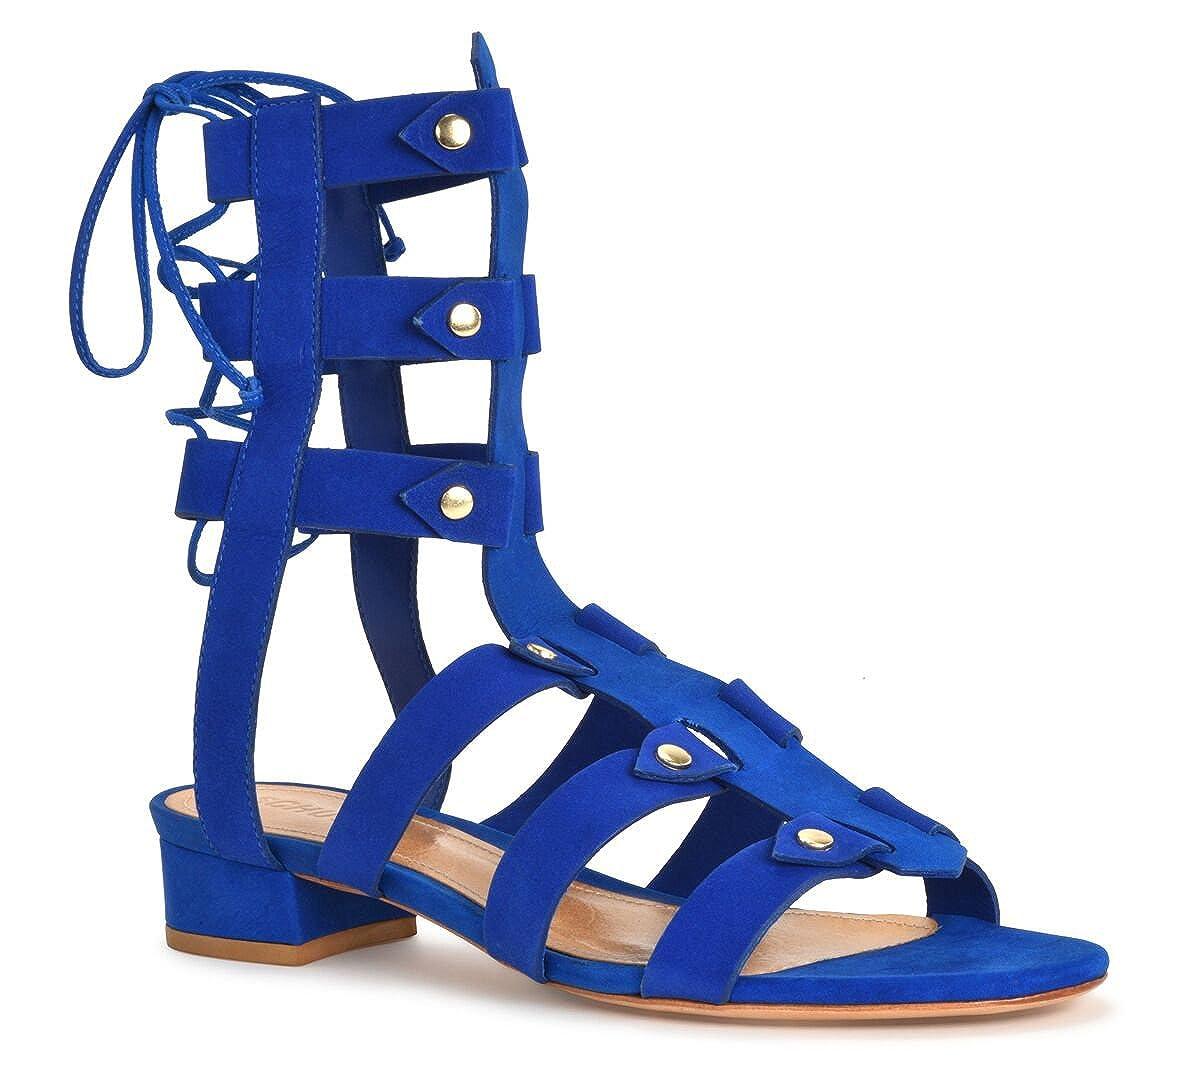 82af7cc46fe Amazon.com  SCHUTZ Women s Rae Klein Cobalt Royal Blue Studded Flat Tie  Back Gladiator Dress Sandal  Shoes